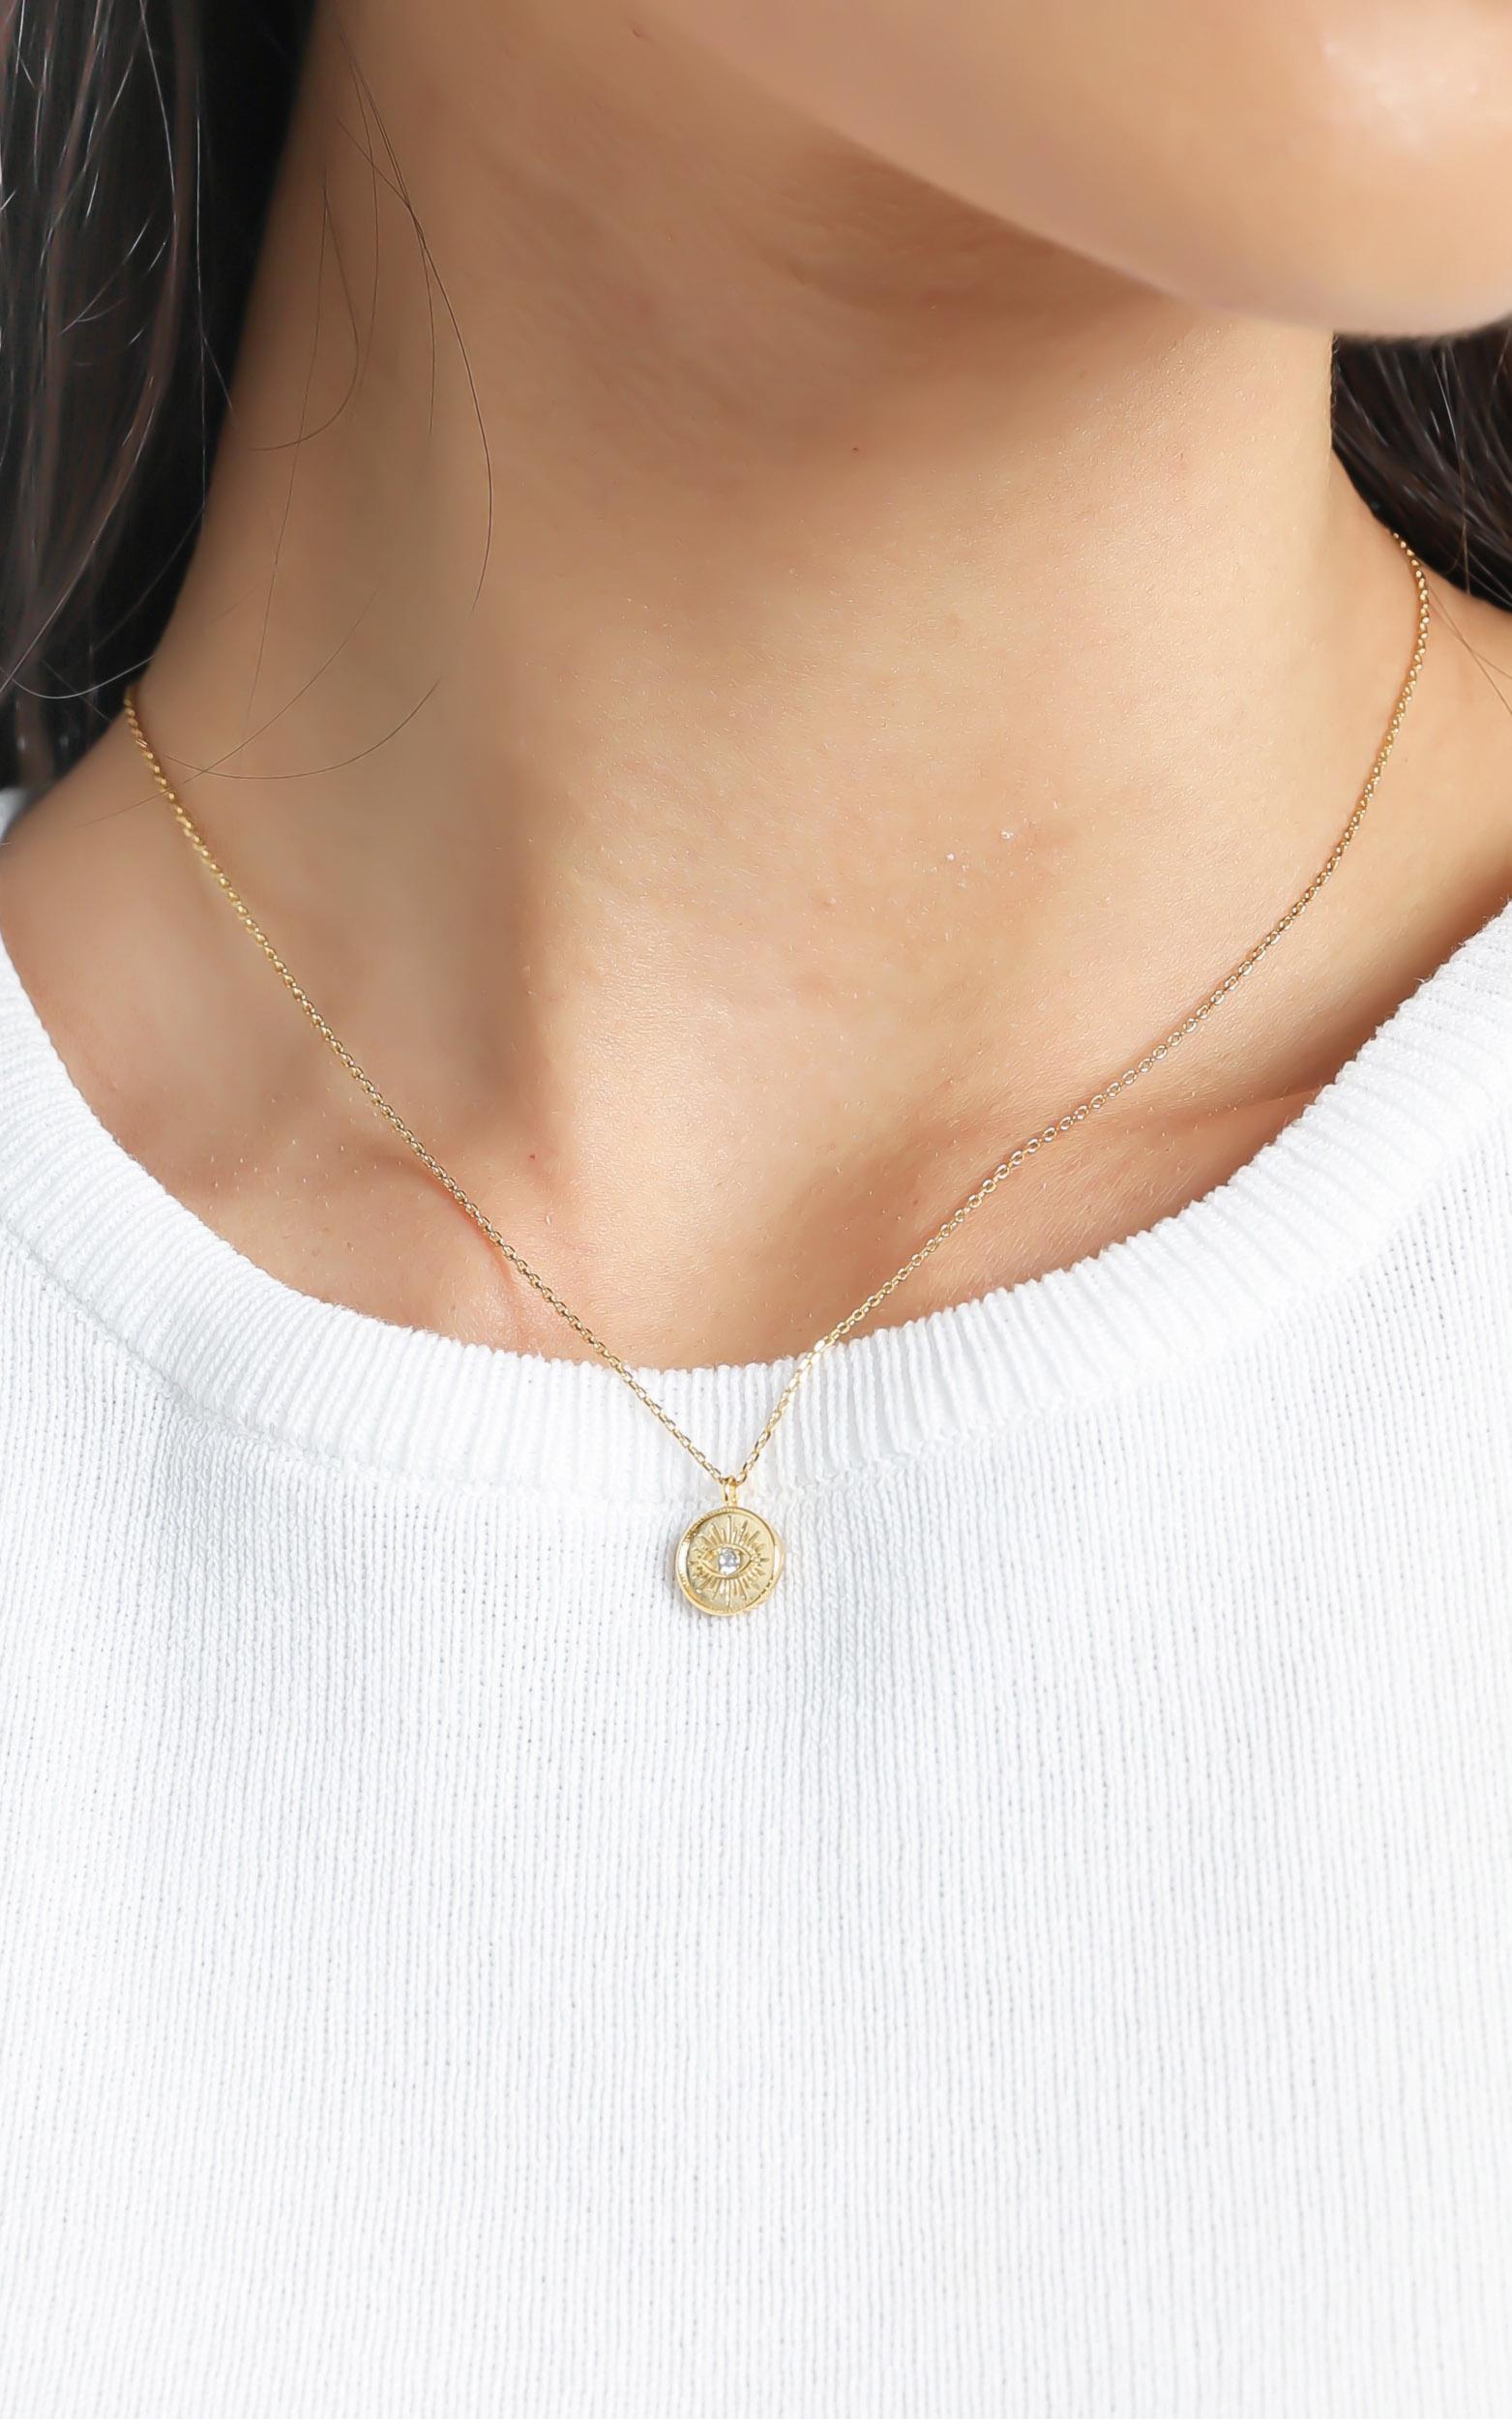 Jolie & Deen - Emilia Eye Necklace in Gold, , hi-res image number null